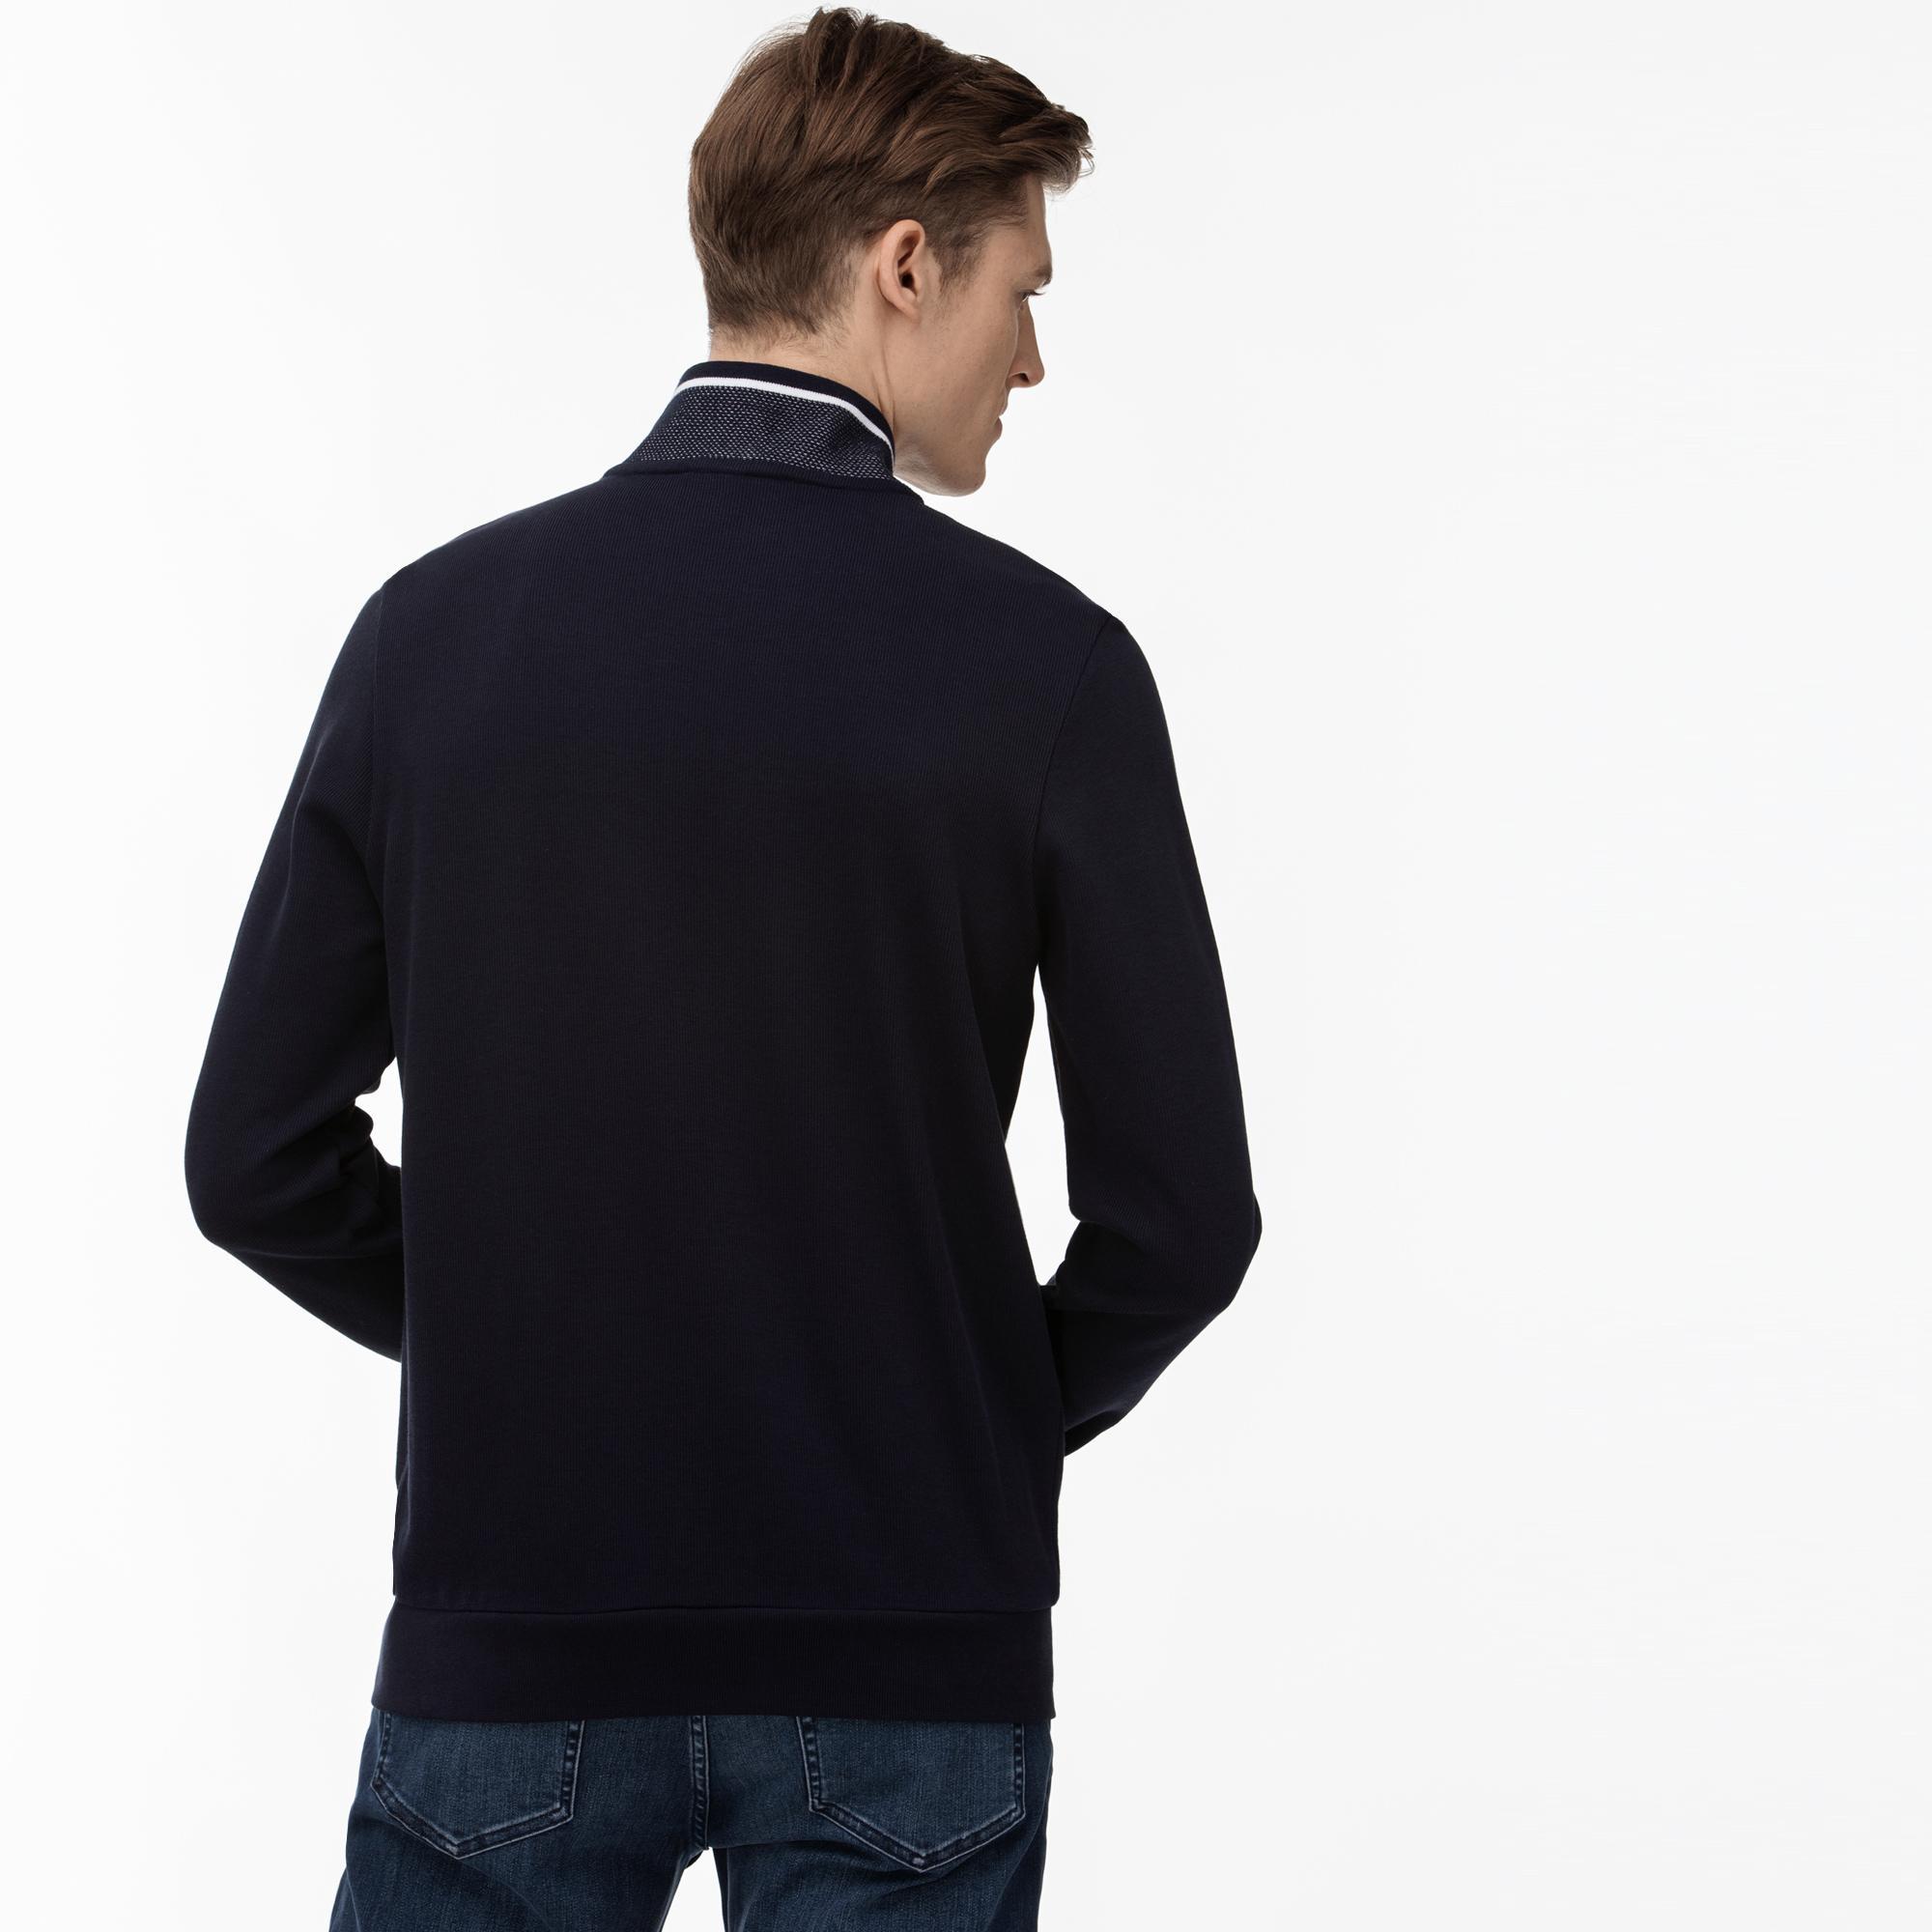 Lacoste Men's Zipped Sweatshirt